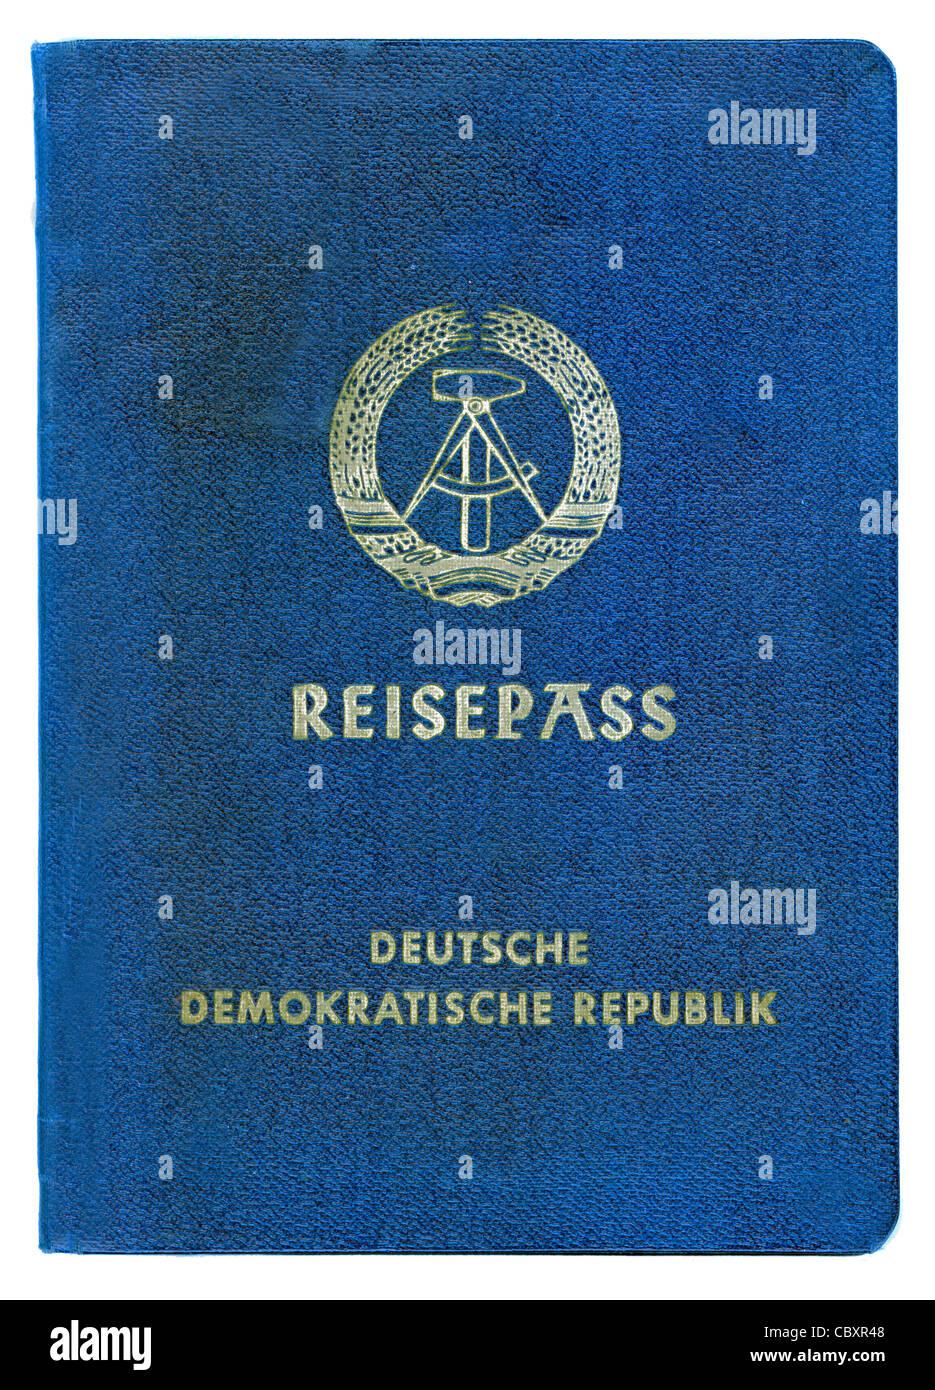 Passport of the German Democratic Republic GDR. - Stock Image